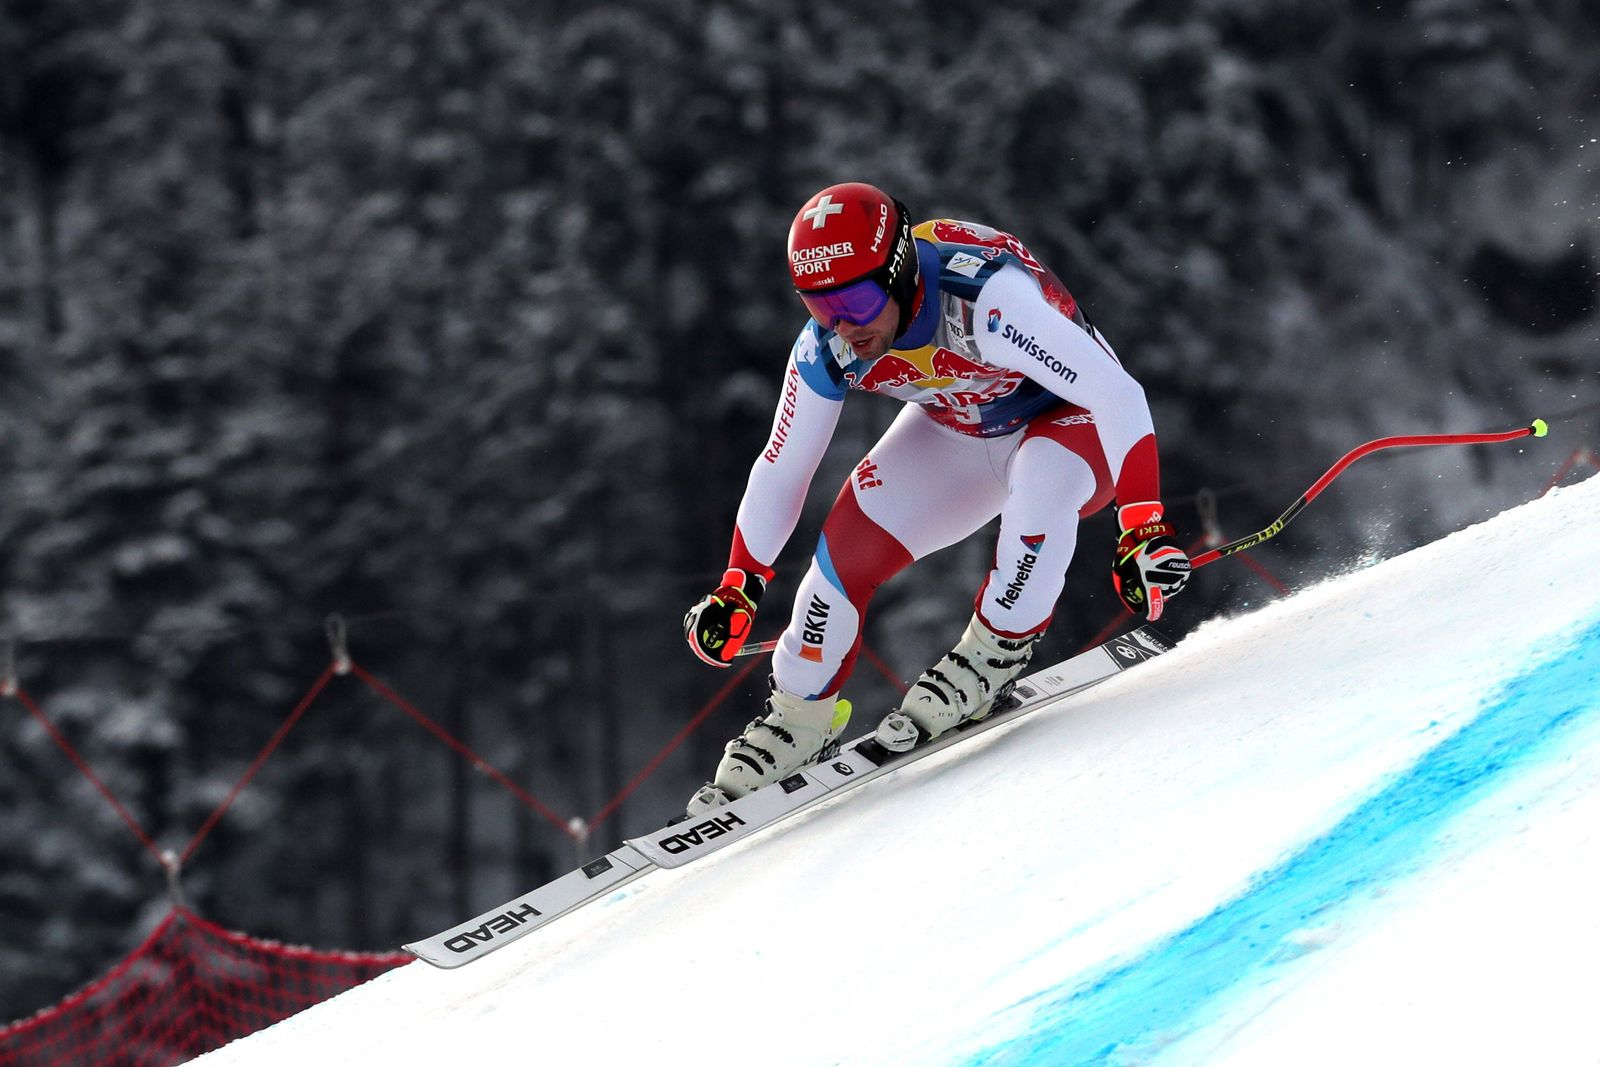 ALPINE SKIING - FIS WC Kitzbuehel KITZBUEHEL,AUSTRIA,24.JAN.21 - ALPINE SKIING - FIS World Cup, downhill, men. Image sh